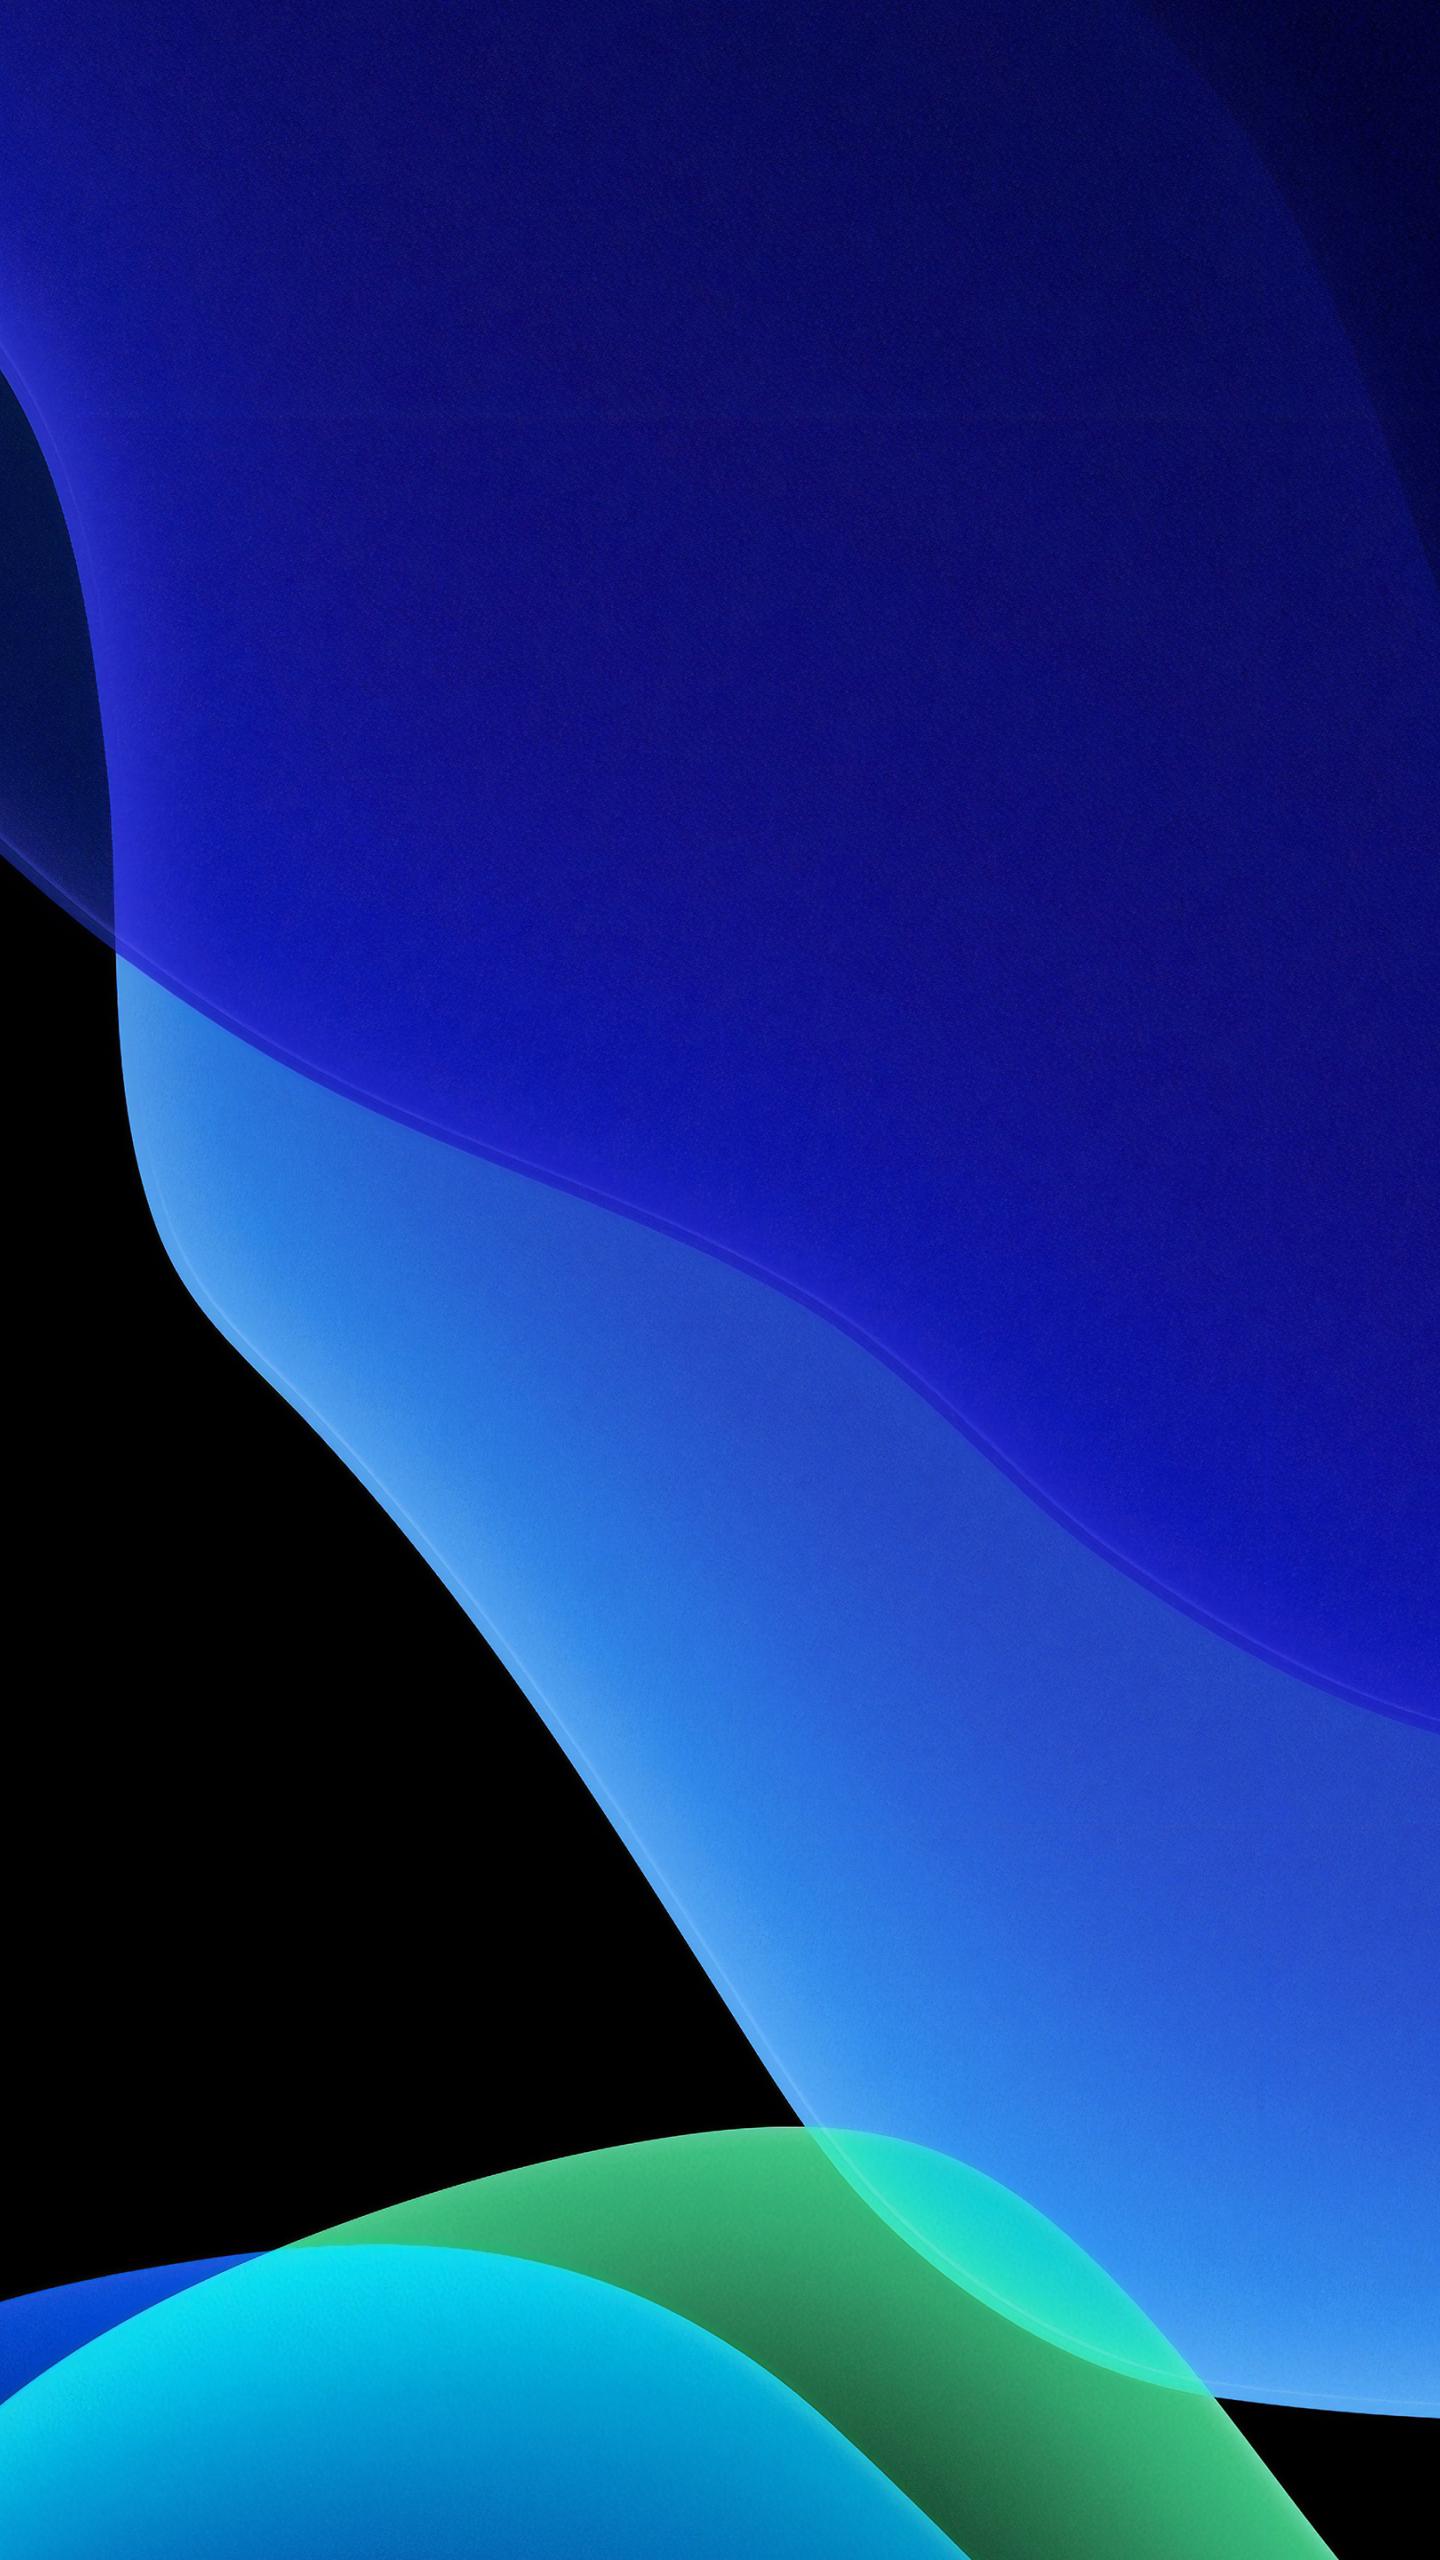 1440x2560 Dark Blue Ios 13 Apple Samsung Galaxy S6 S7 Google Pixel